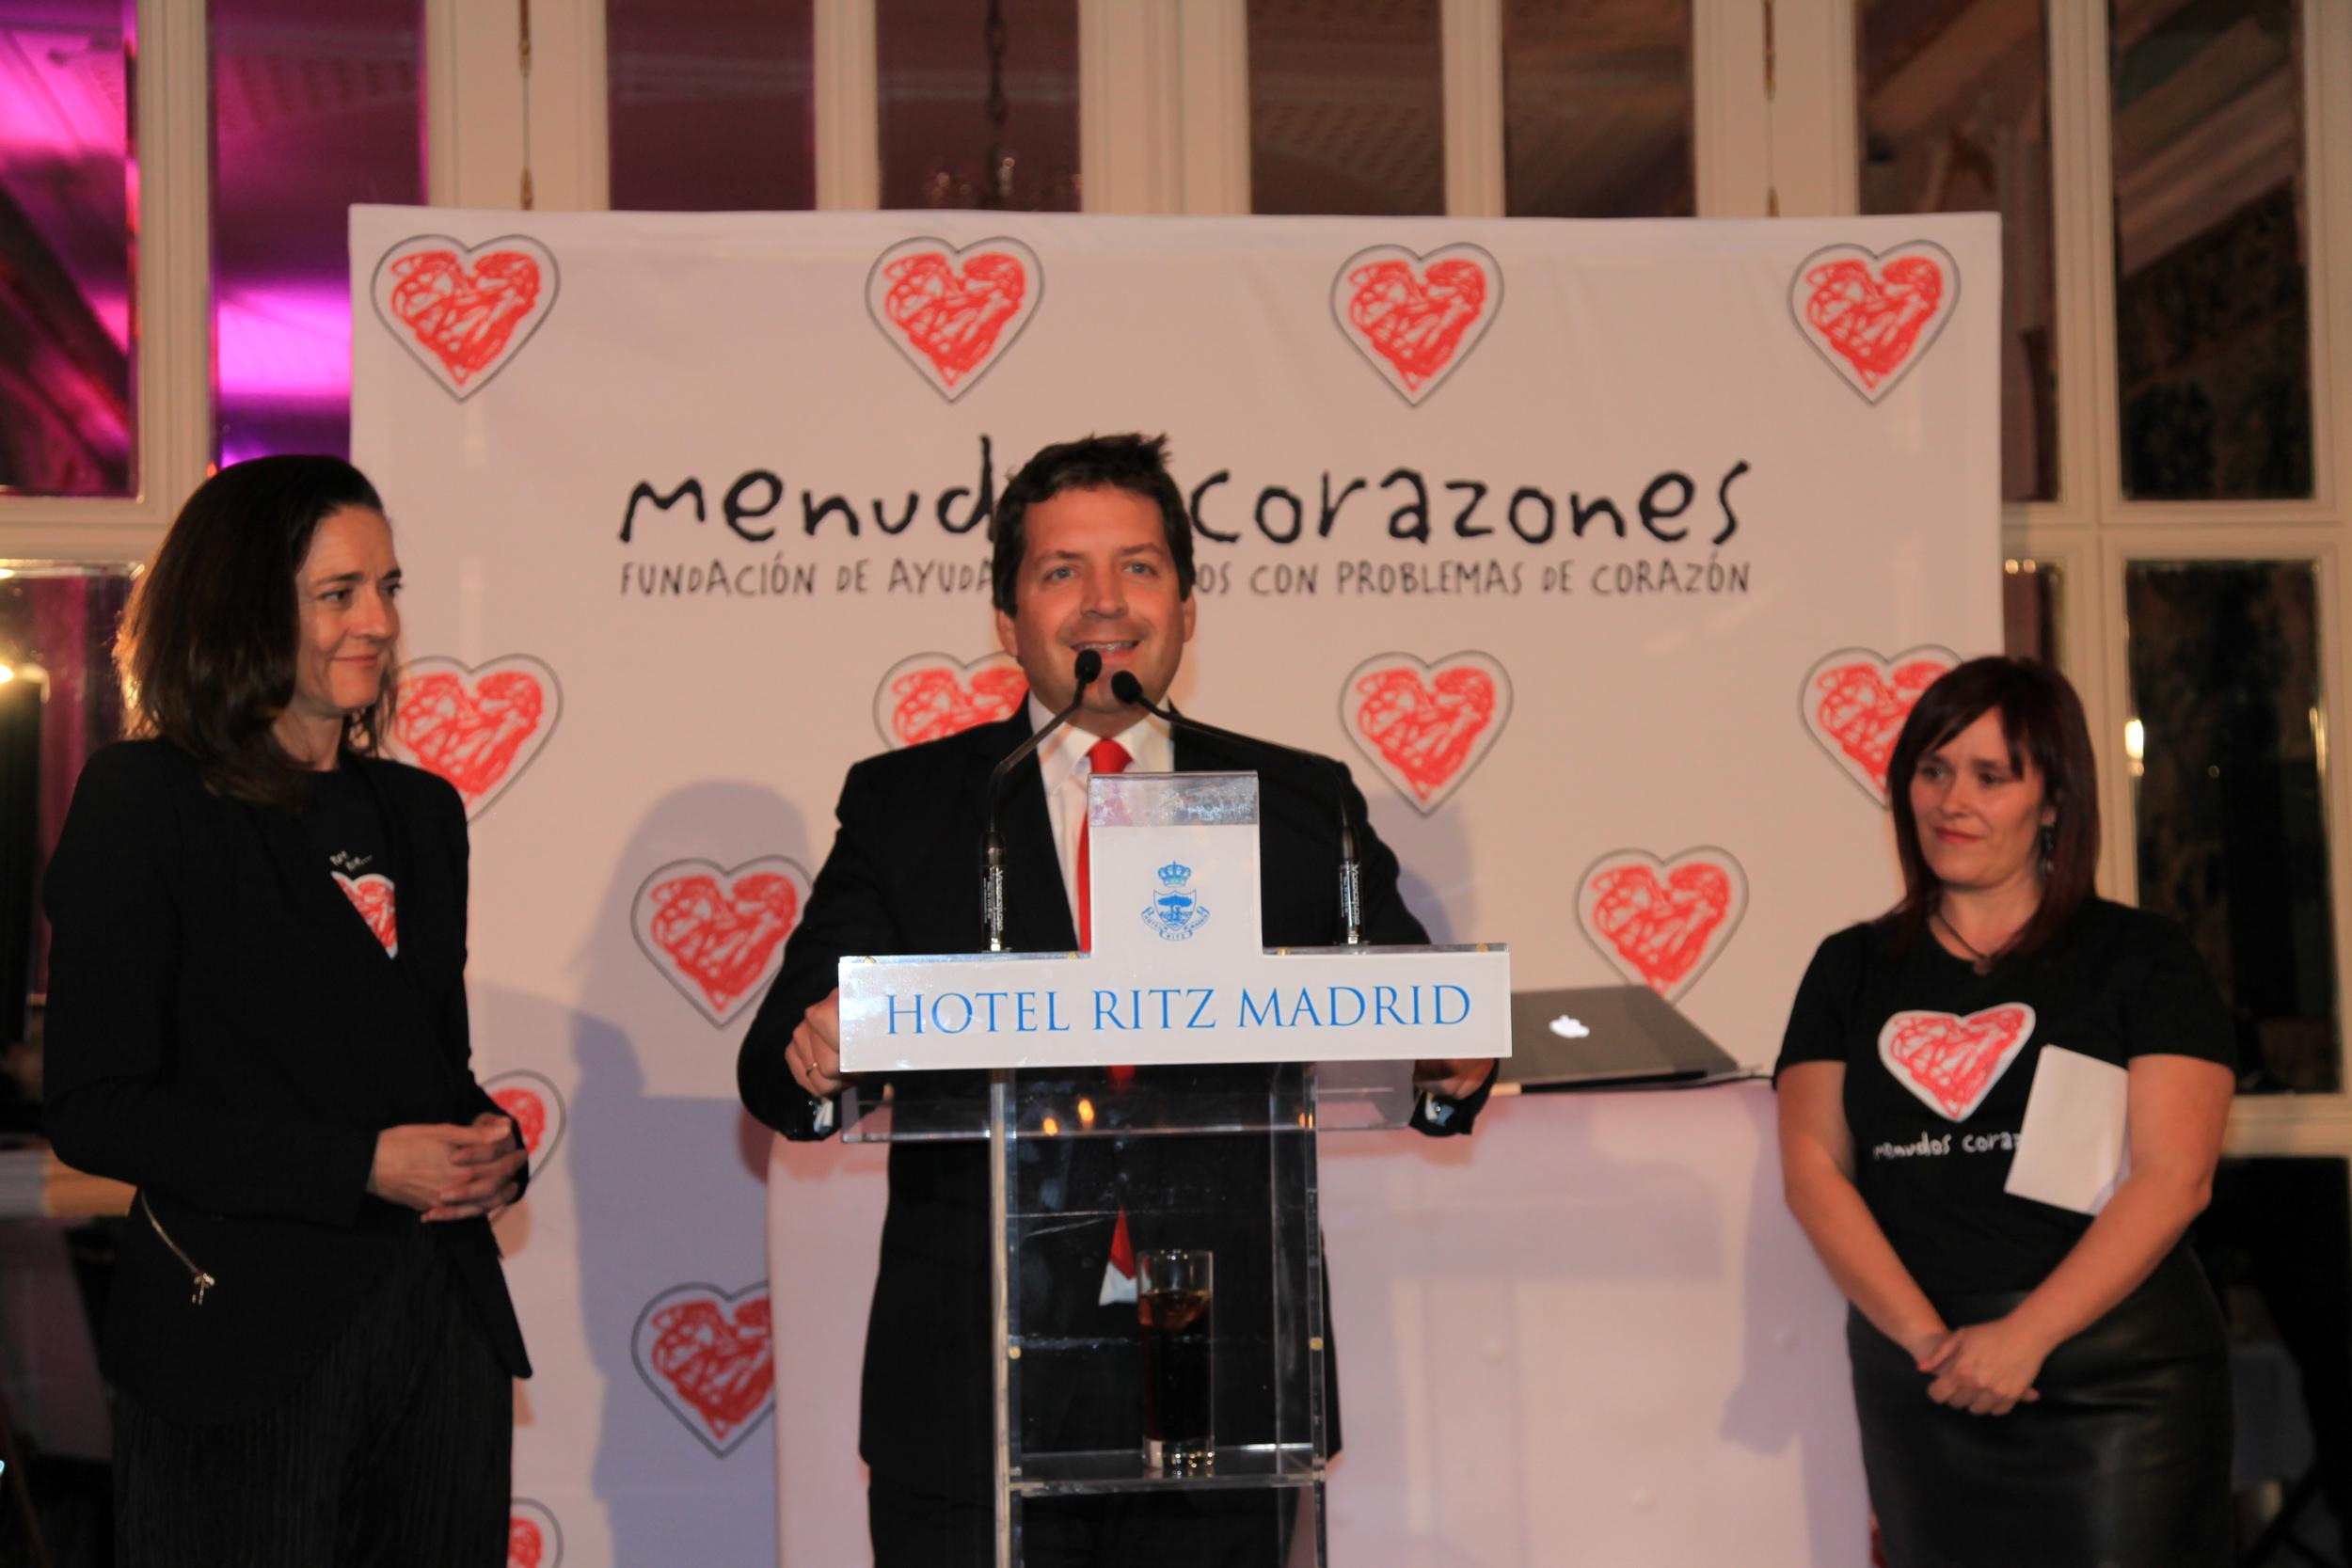 Cristian Tavelli, Director General del Hotel Ritz Madrid